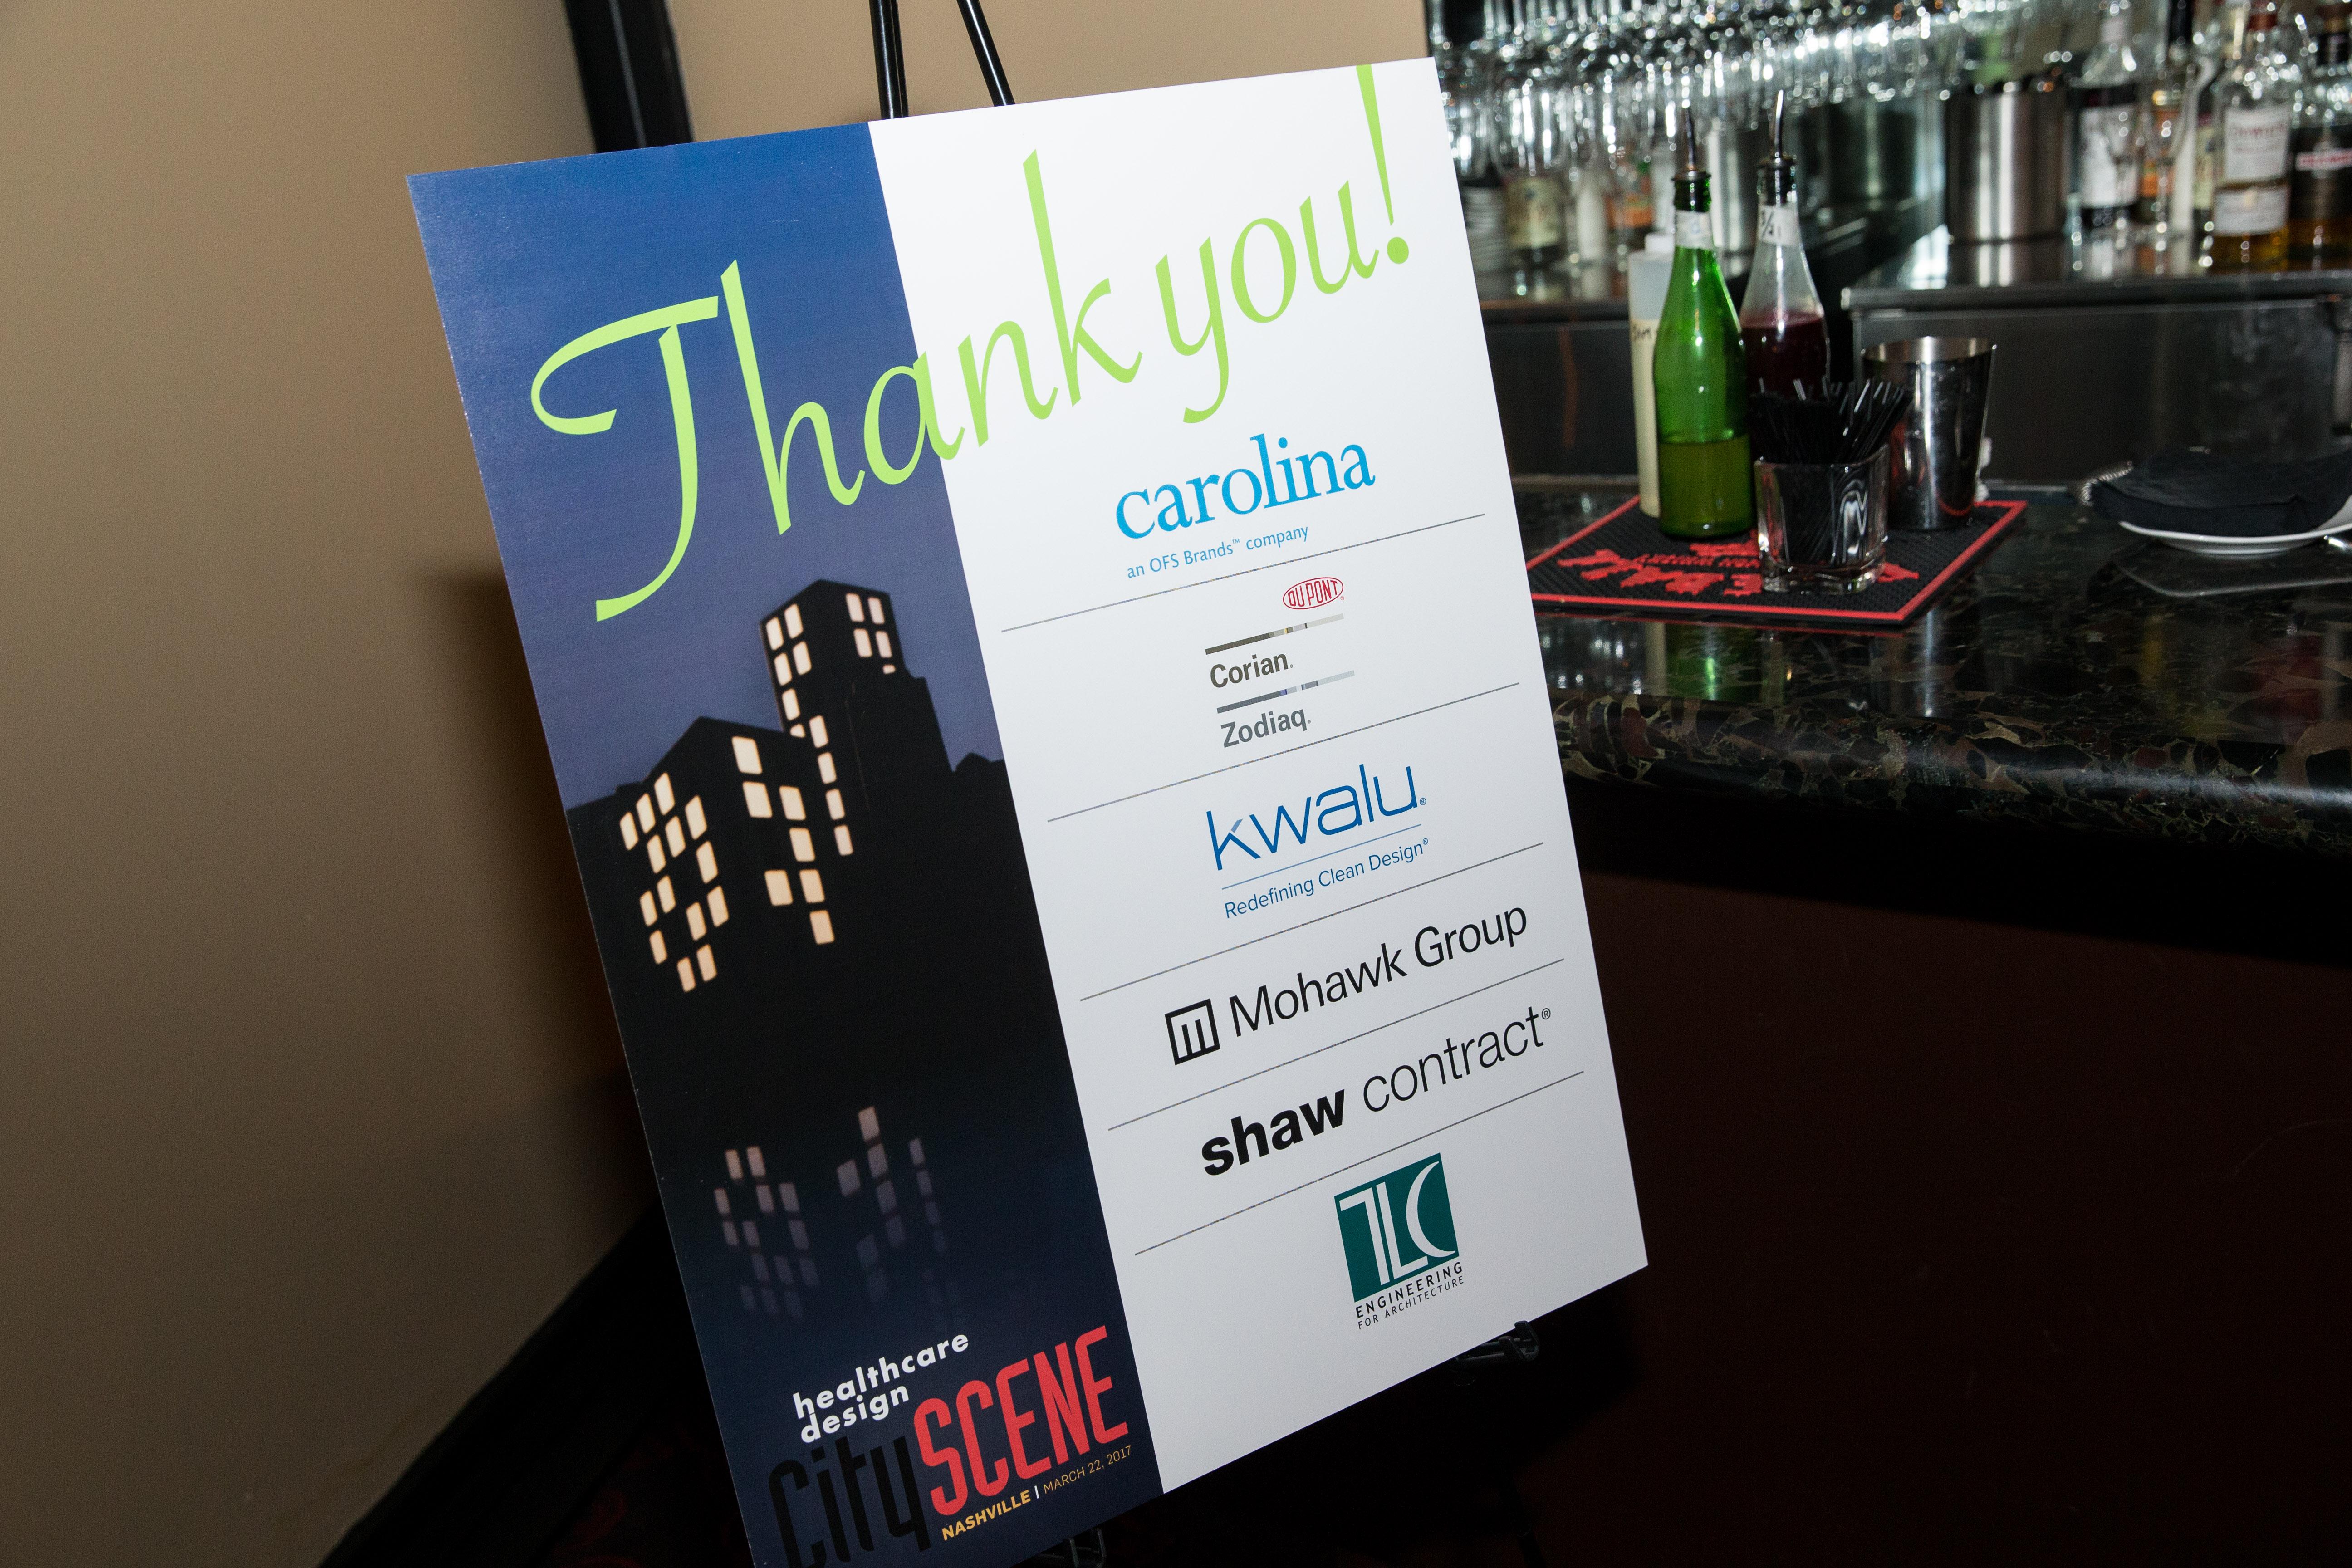 HCD Hosts First 2017 CitySCENE Event In Nashville